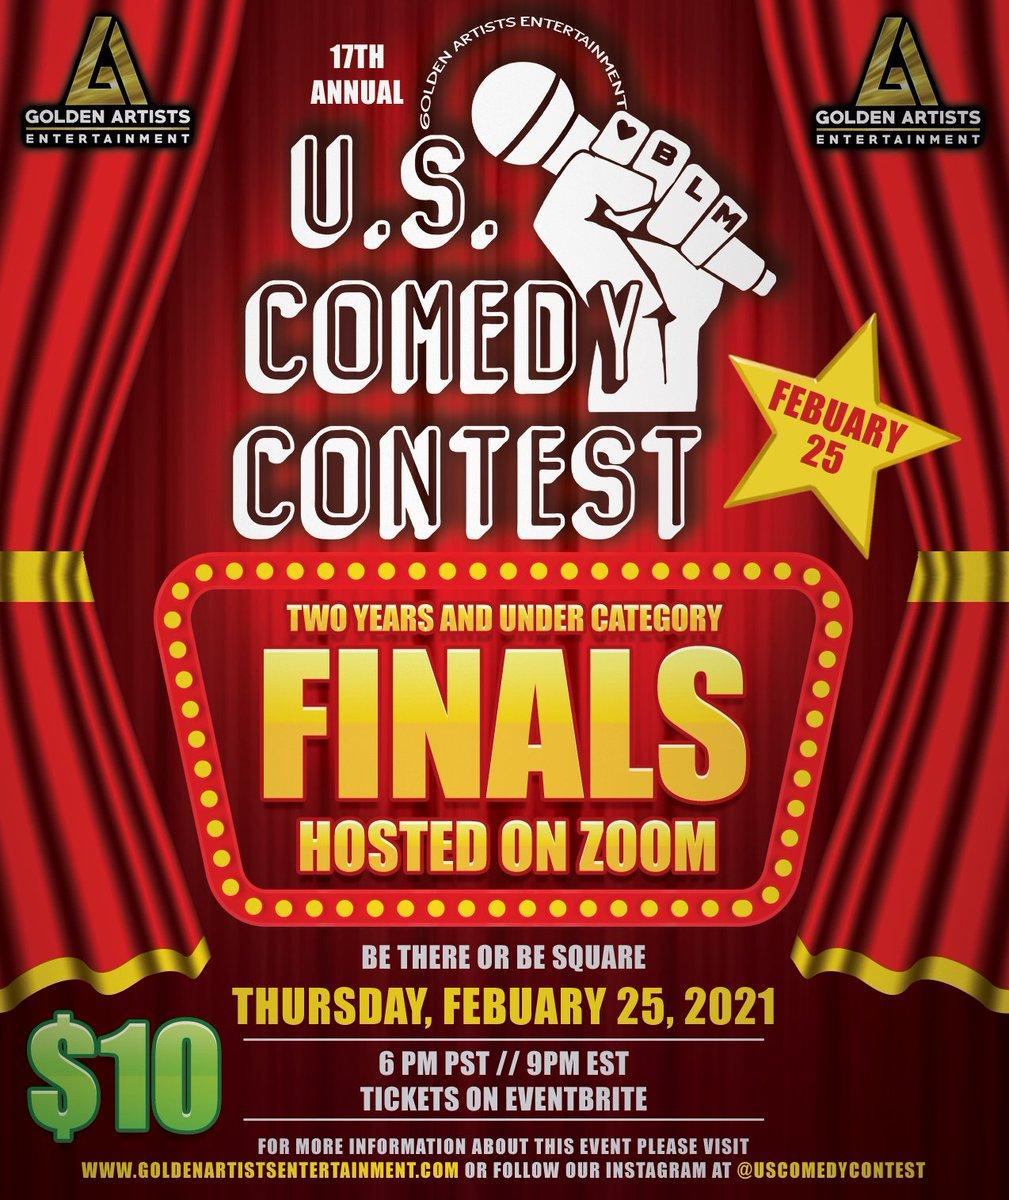 Tomorrow night! 6PM PST! @uscomedycontest #comedy #standupcomedy #Contest